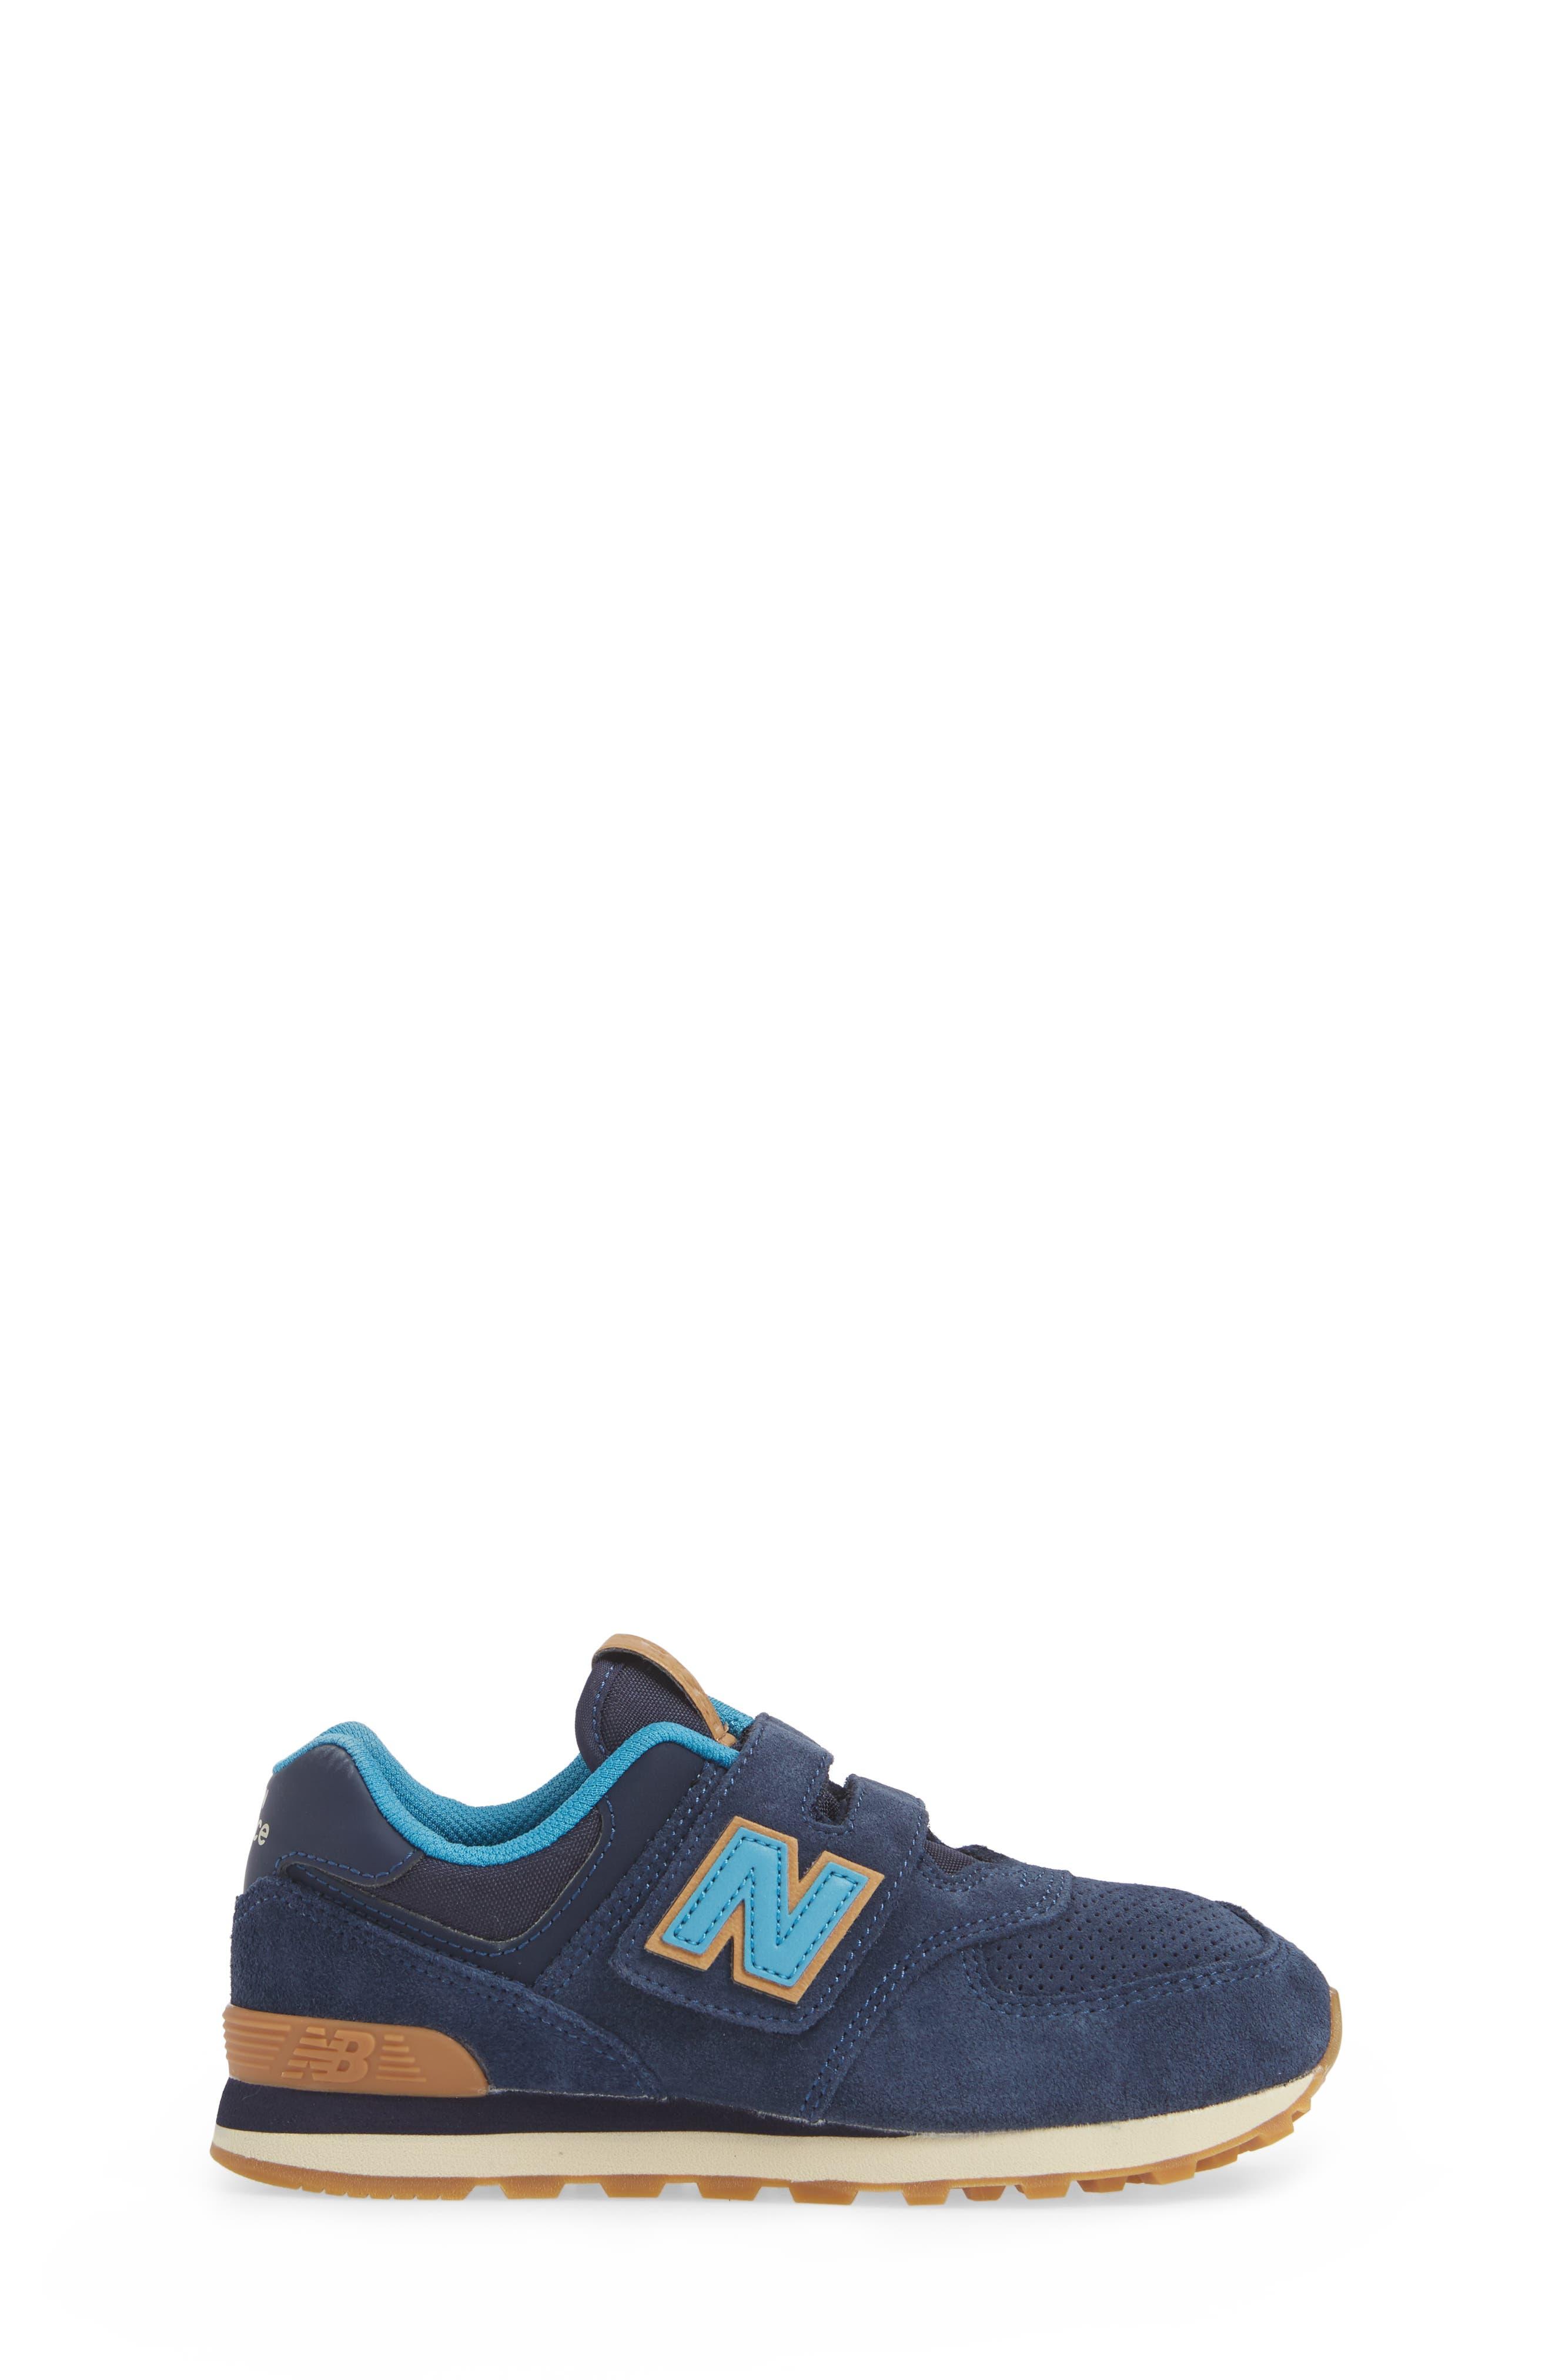 574 Sneaker,                             Alternate thumbnail 3, color,                             PIGMENT